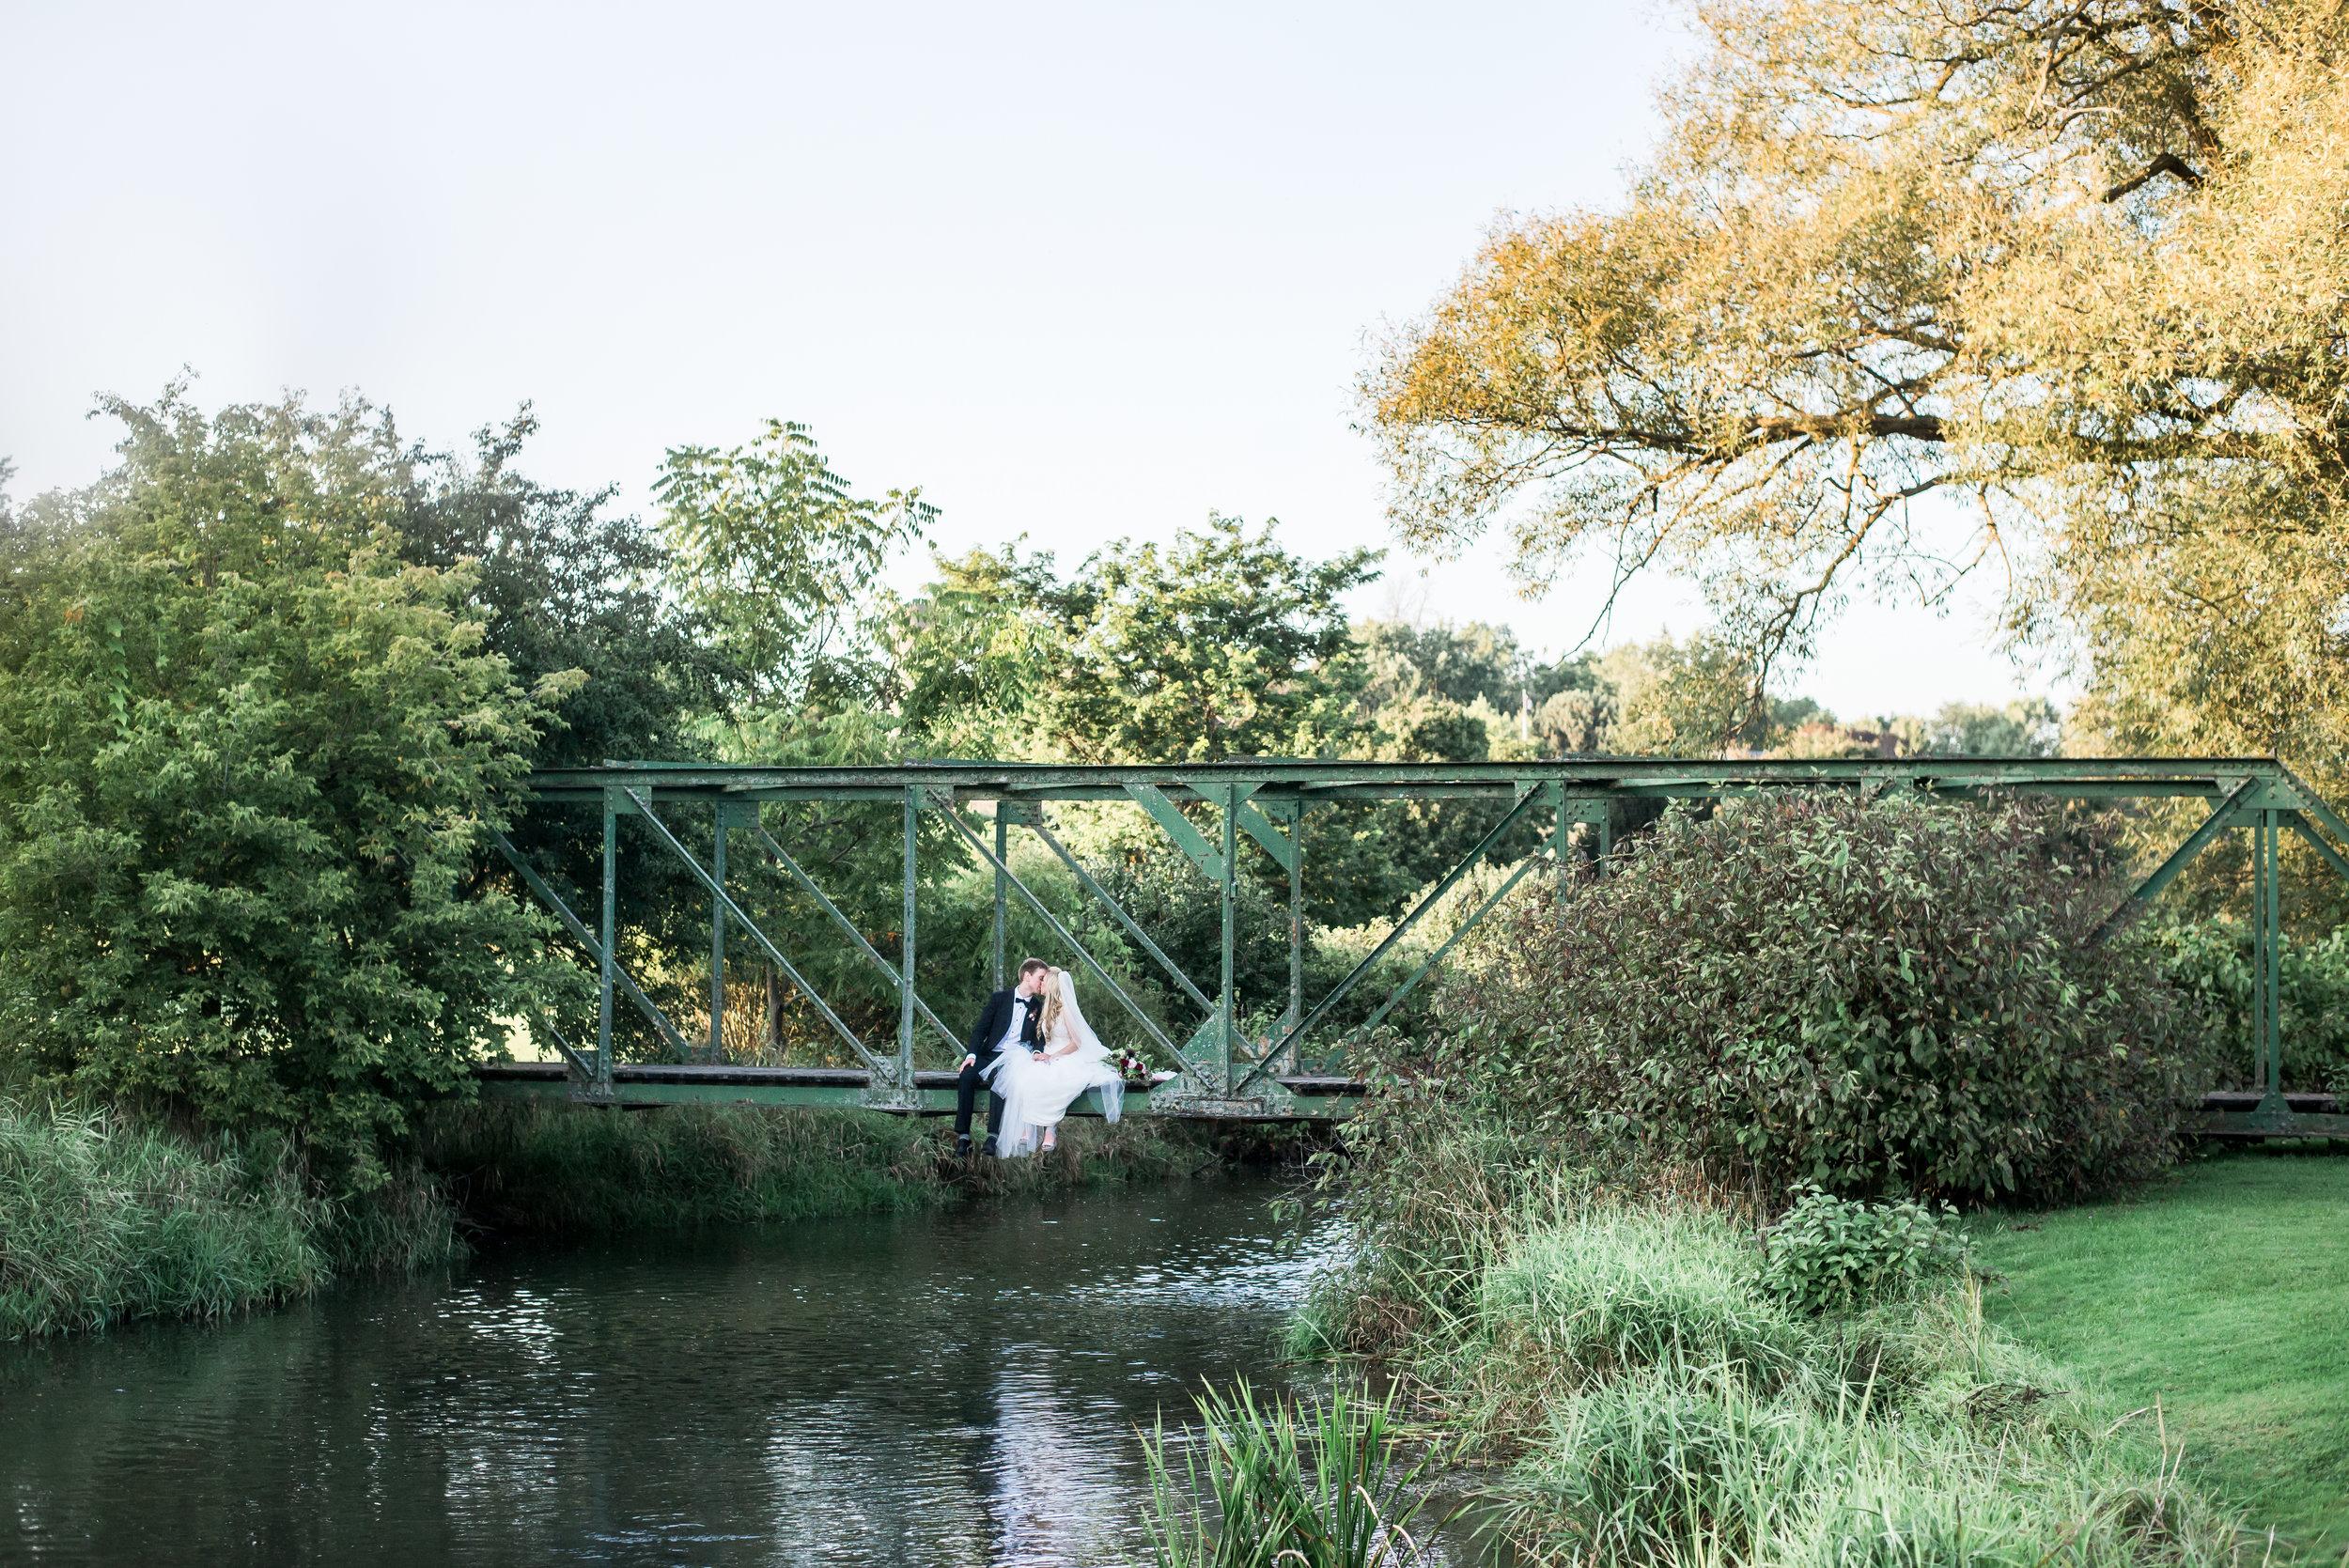 bride_groom_outdoor_wedding_bridge